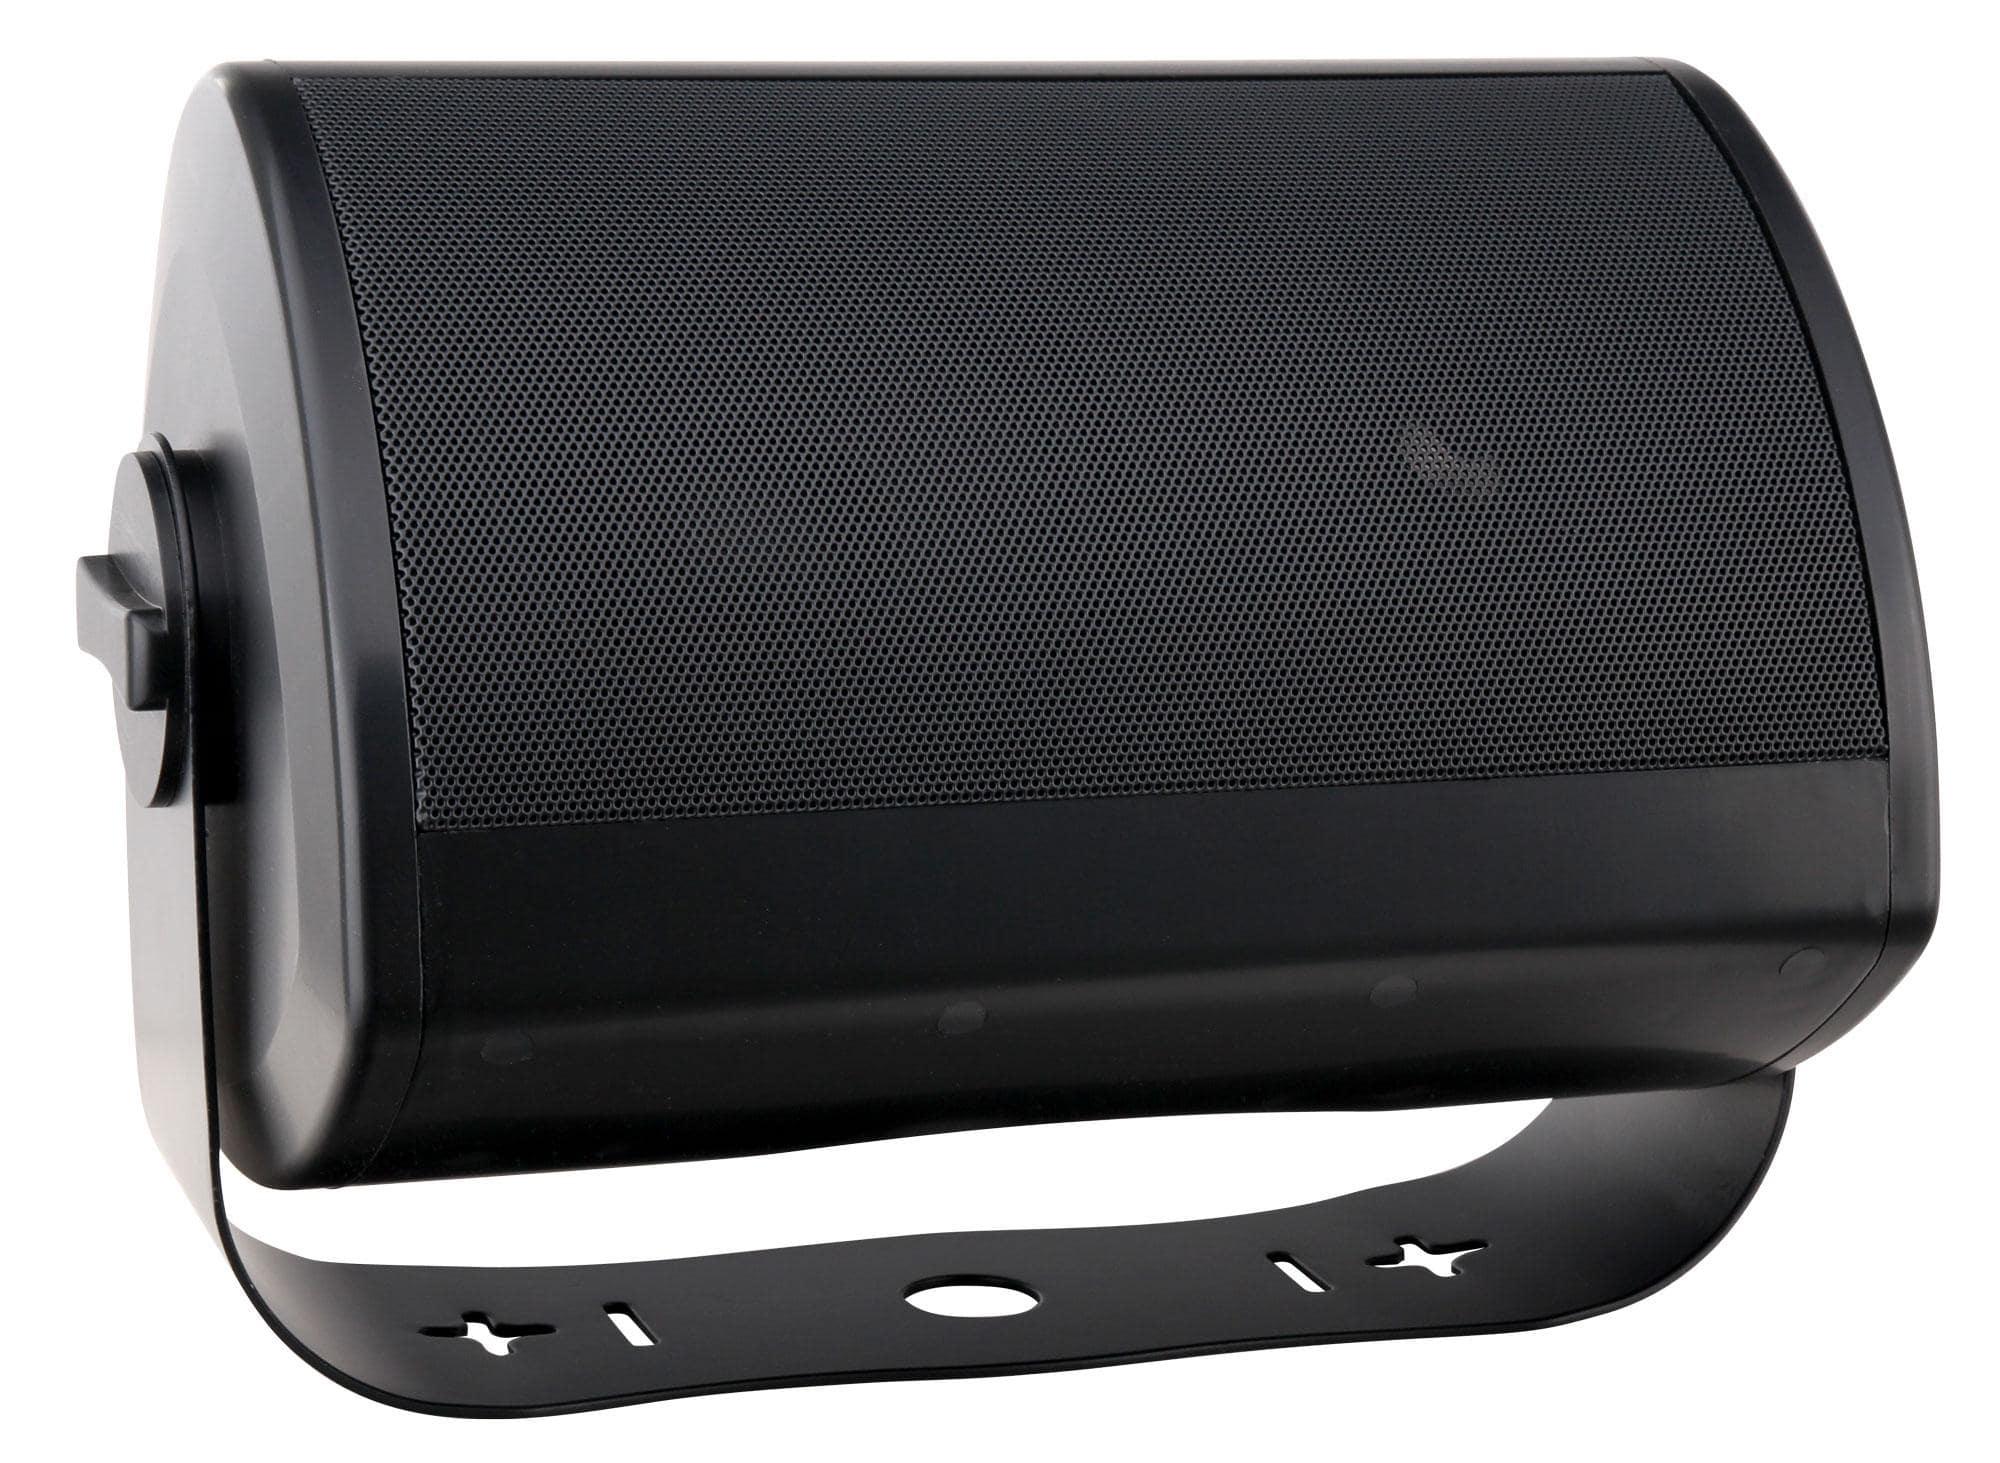 Pronomic OLS 10 BK Outdoor Lautsprecher schwarz 100 Watt Retoure (Zustand sehr gut)